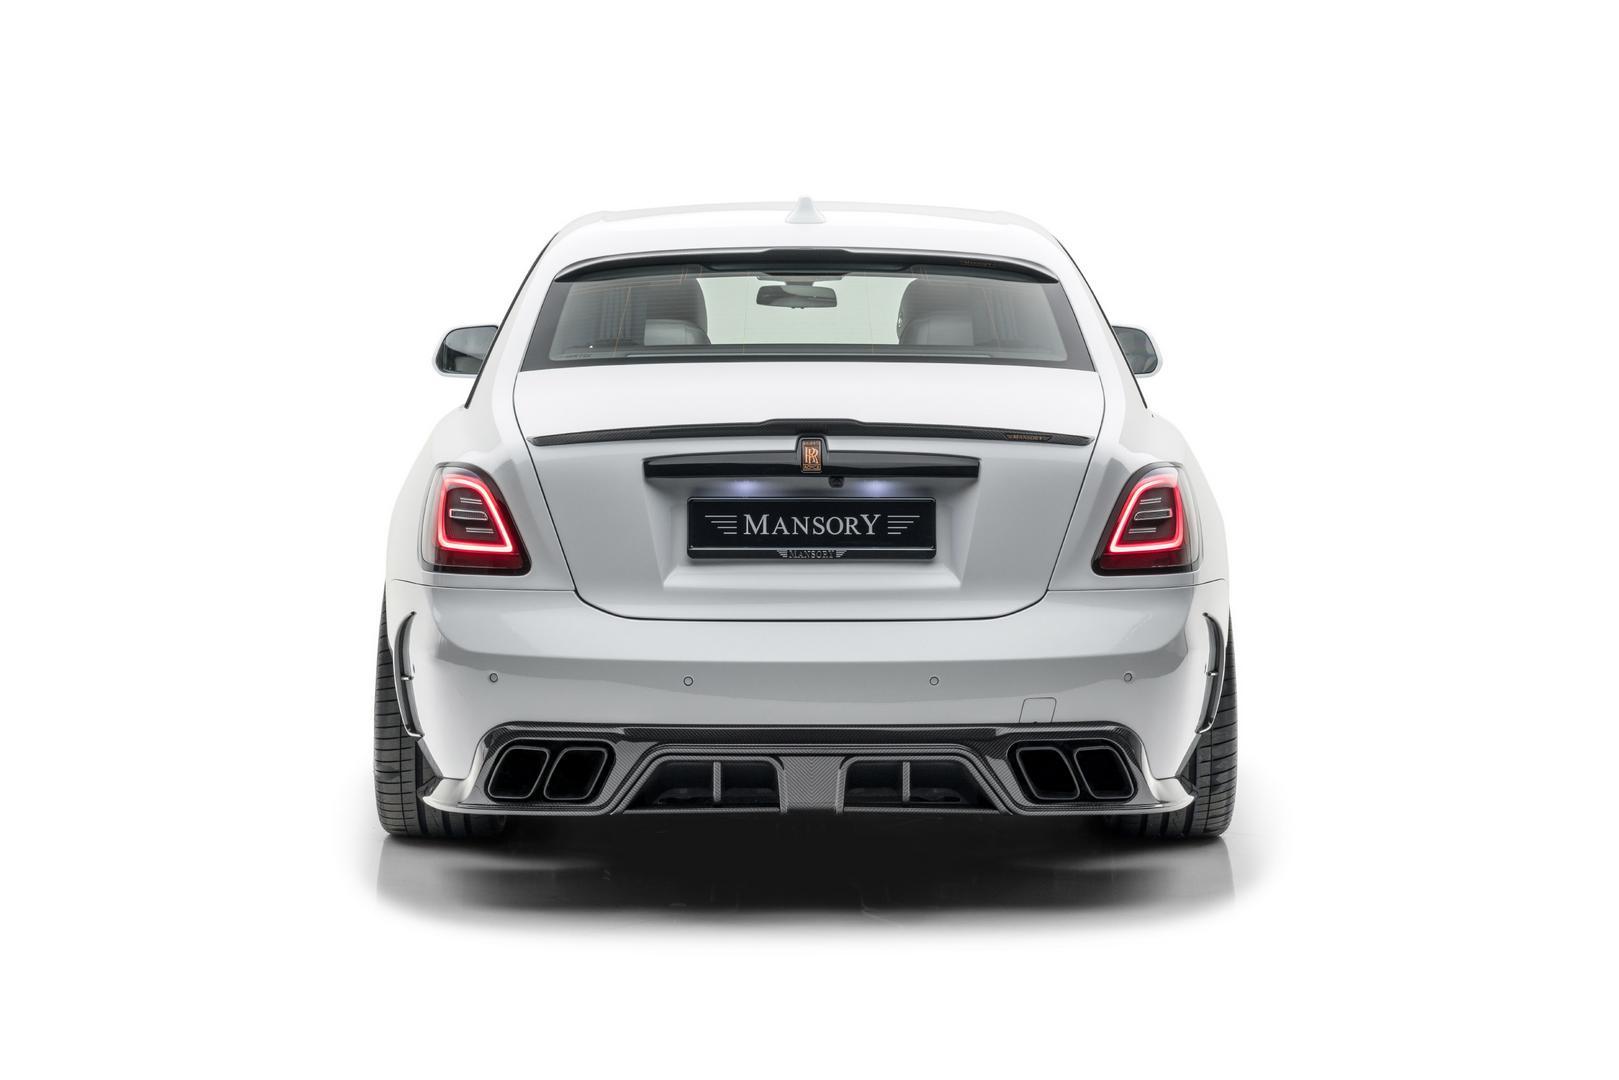 Mansory RR Ghost rear design